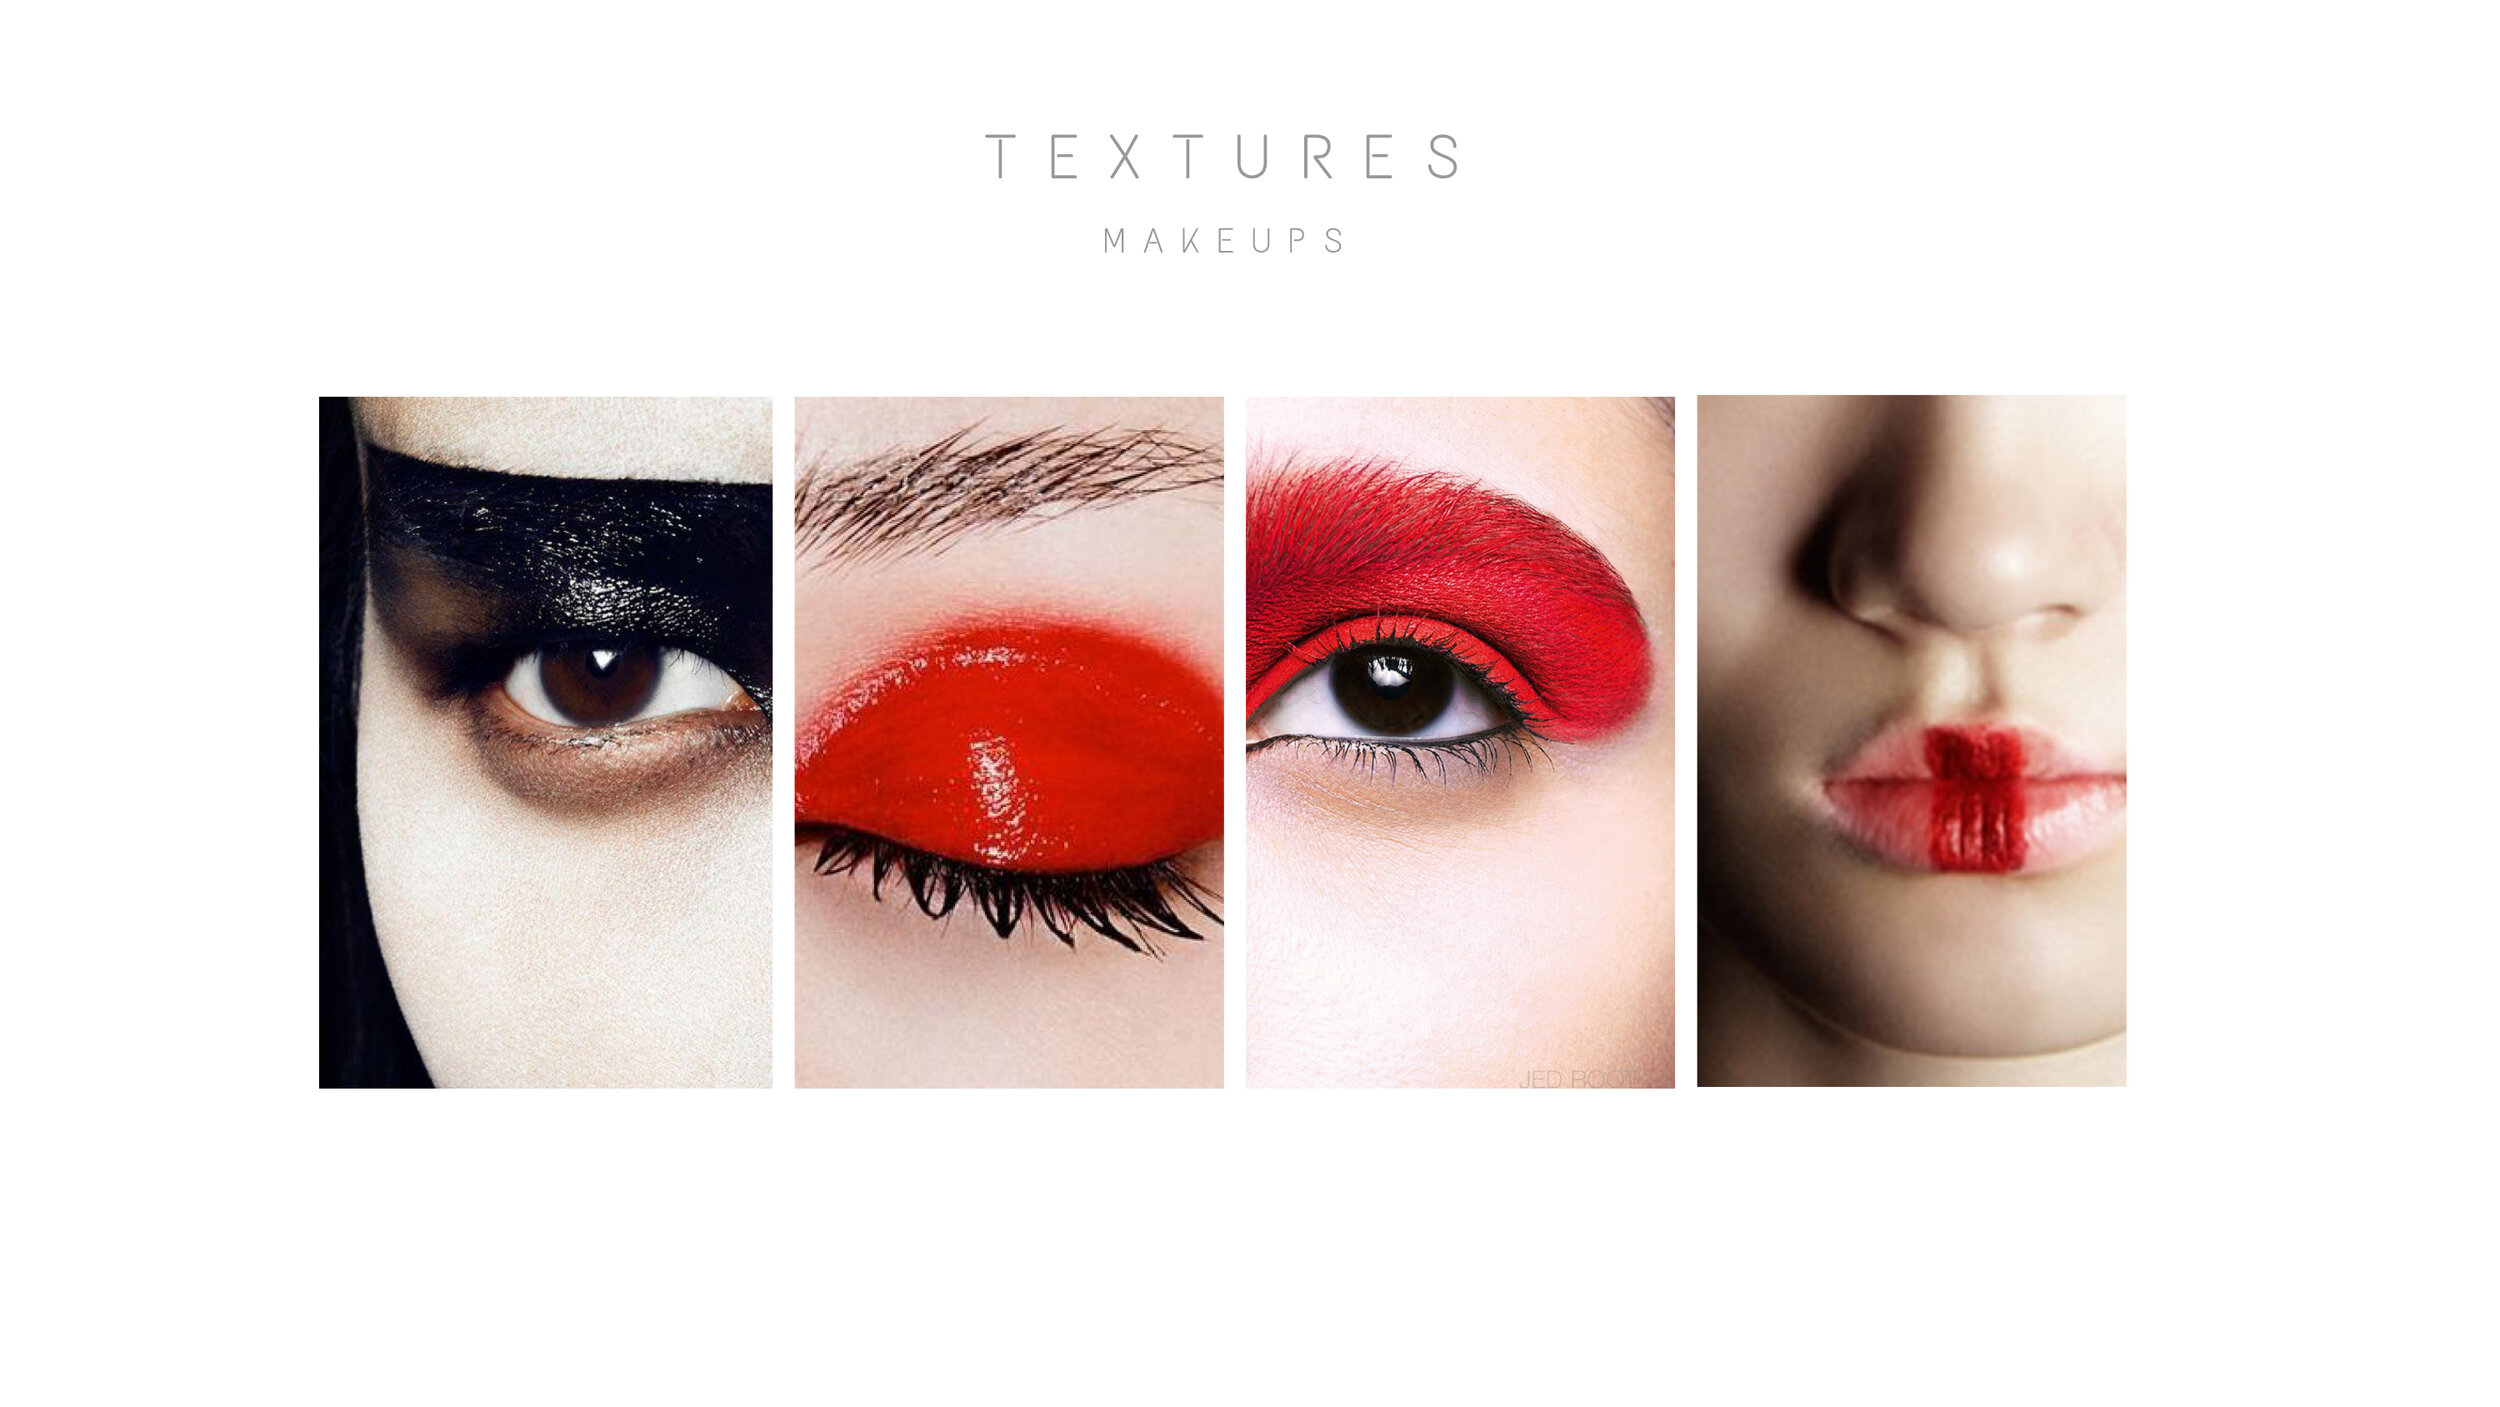 shiseido_brandbook_texture4.jpg